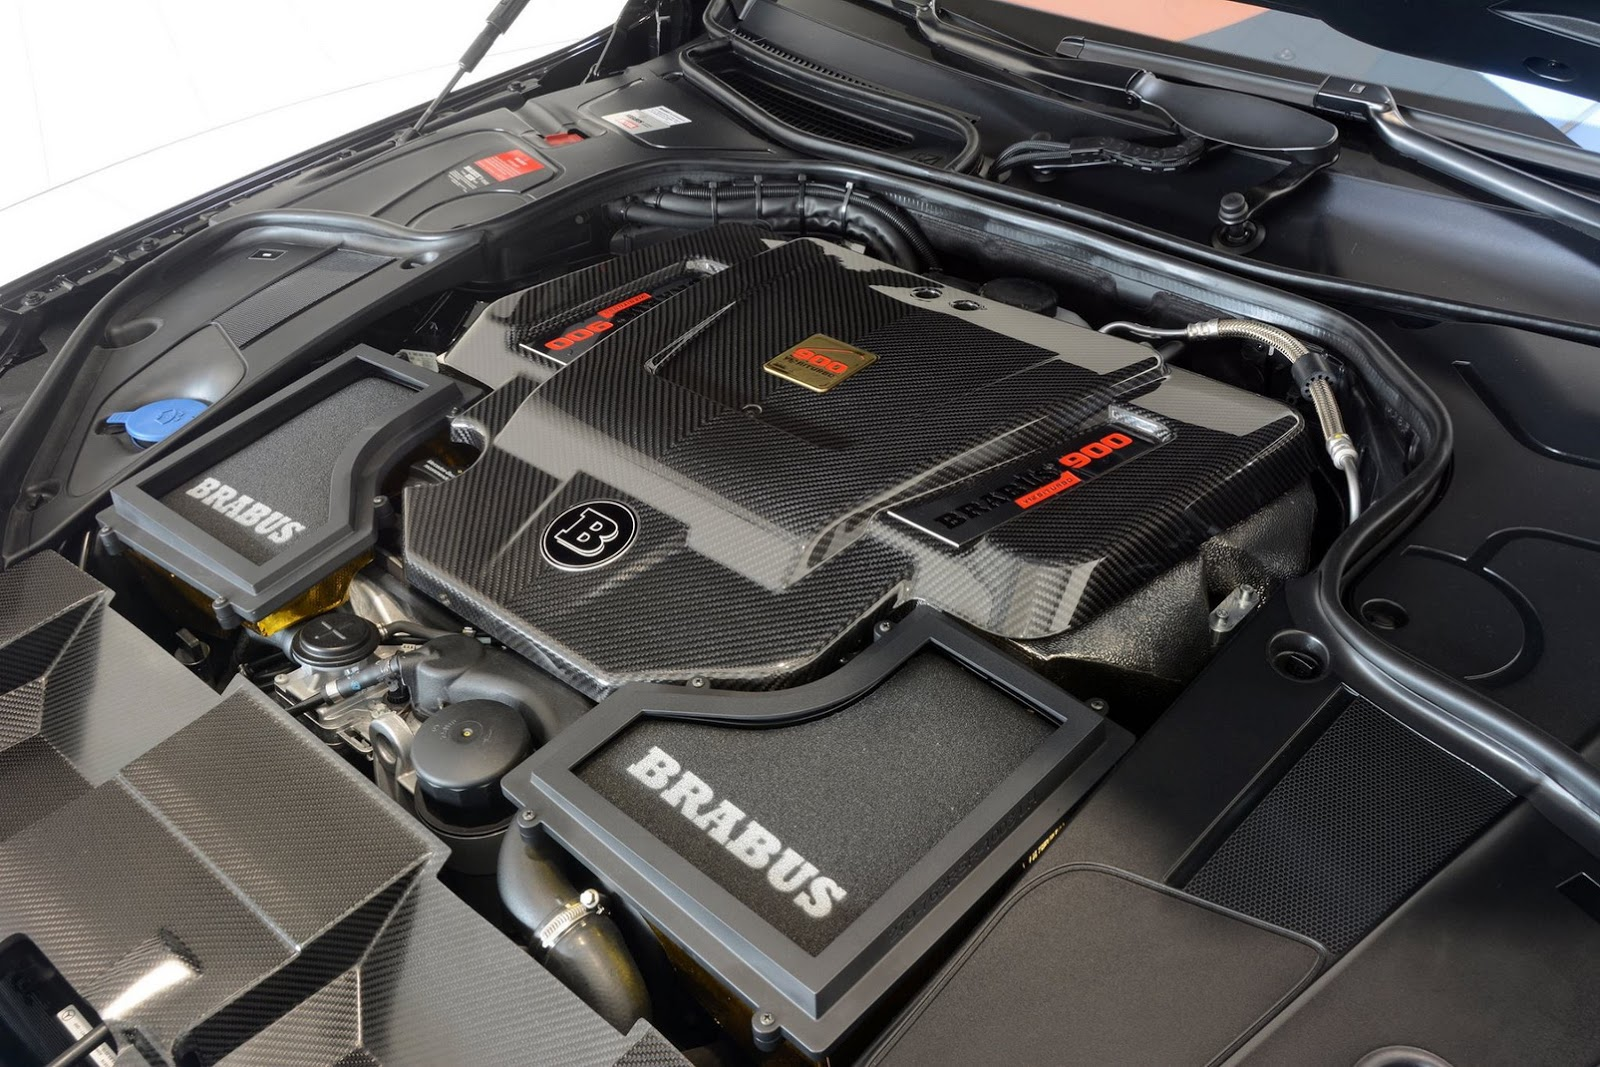 Brabus Maybach-Based Rocket 900 bán giá 500.478 bảng